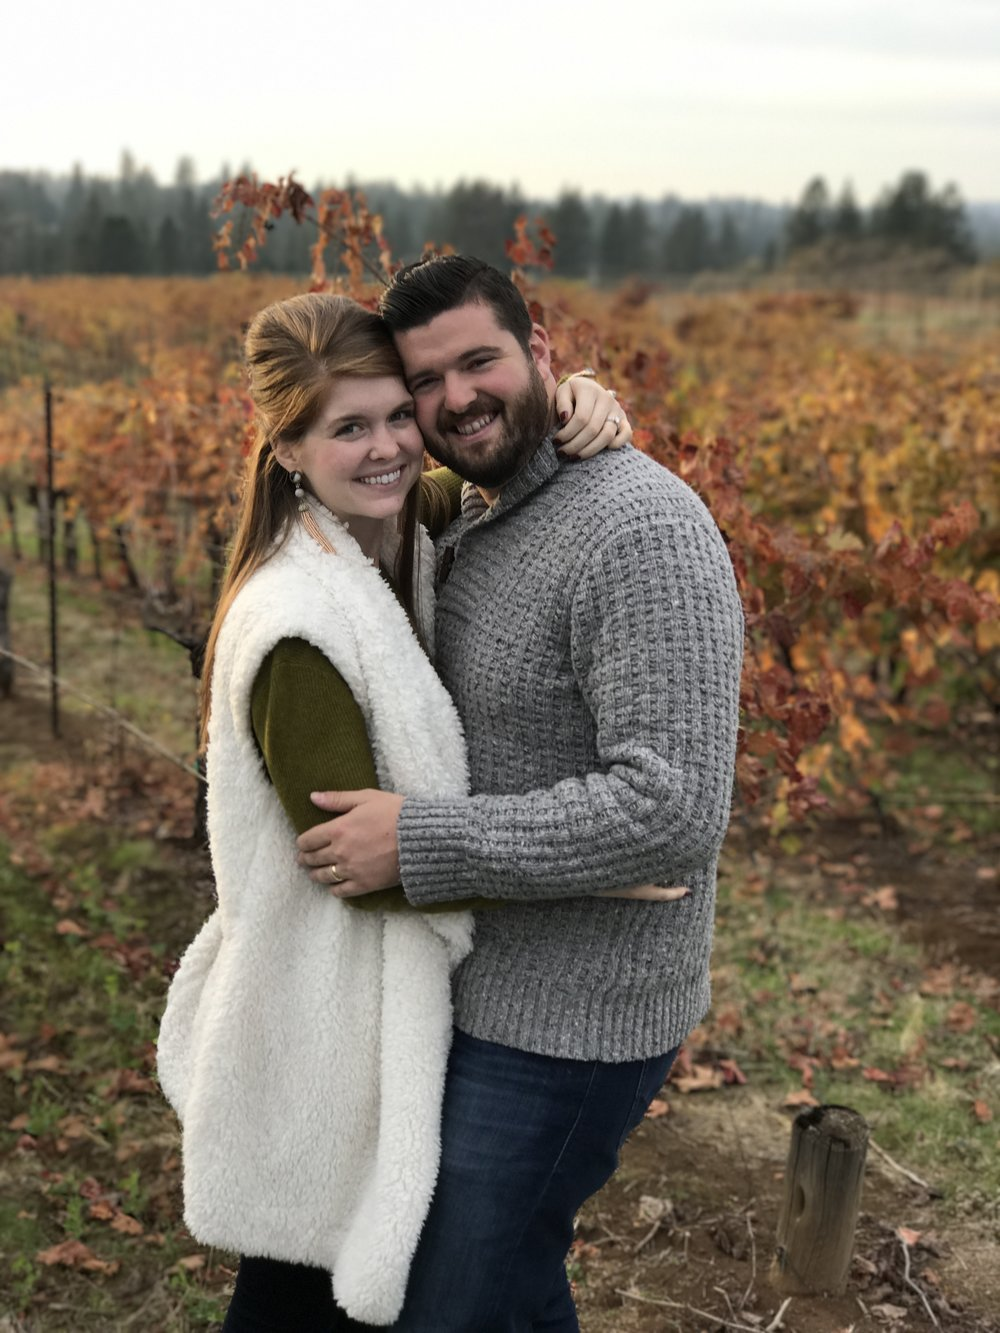 northern california winery guide, nor cal, where to wine taste in northern california, sacramento, amador county, el dorado county, california